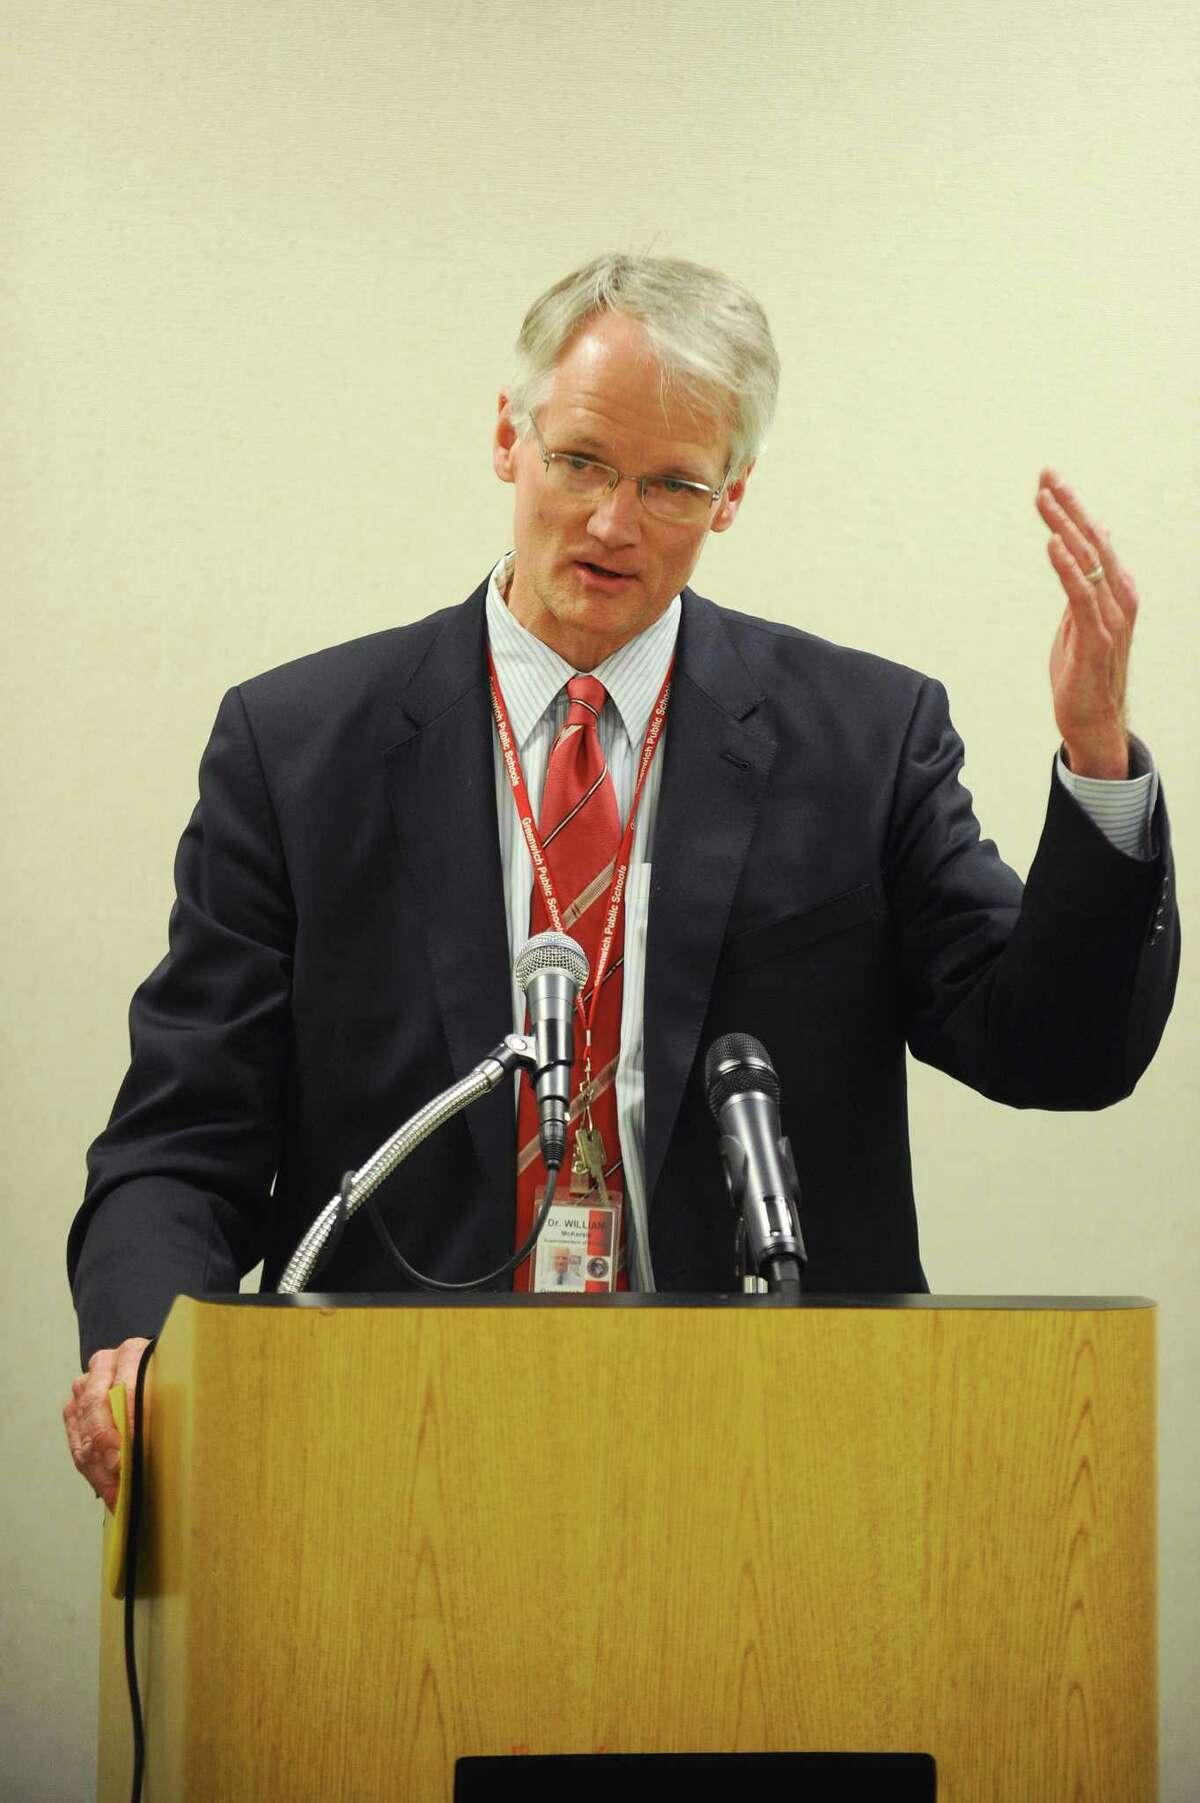 Superintendent of Schools William McKersie